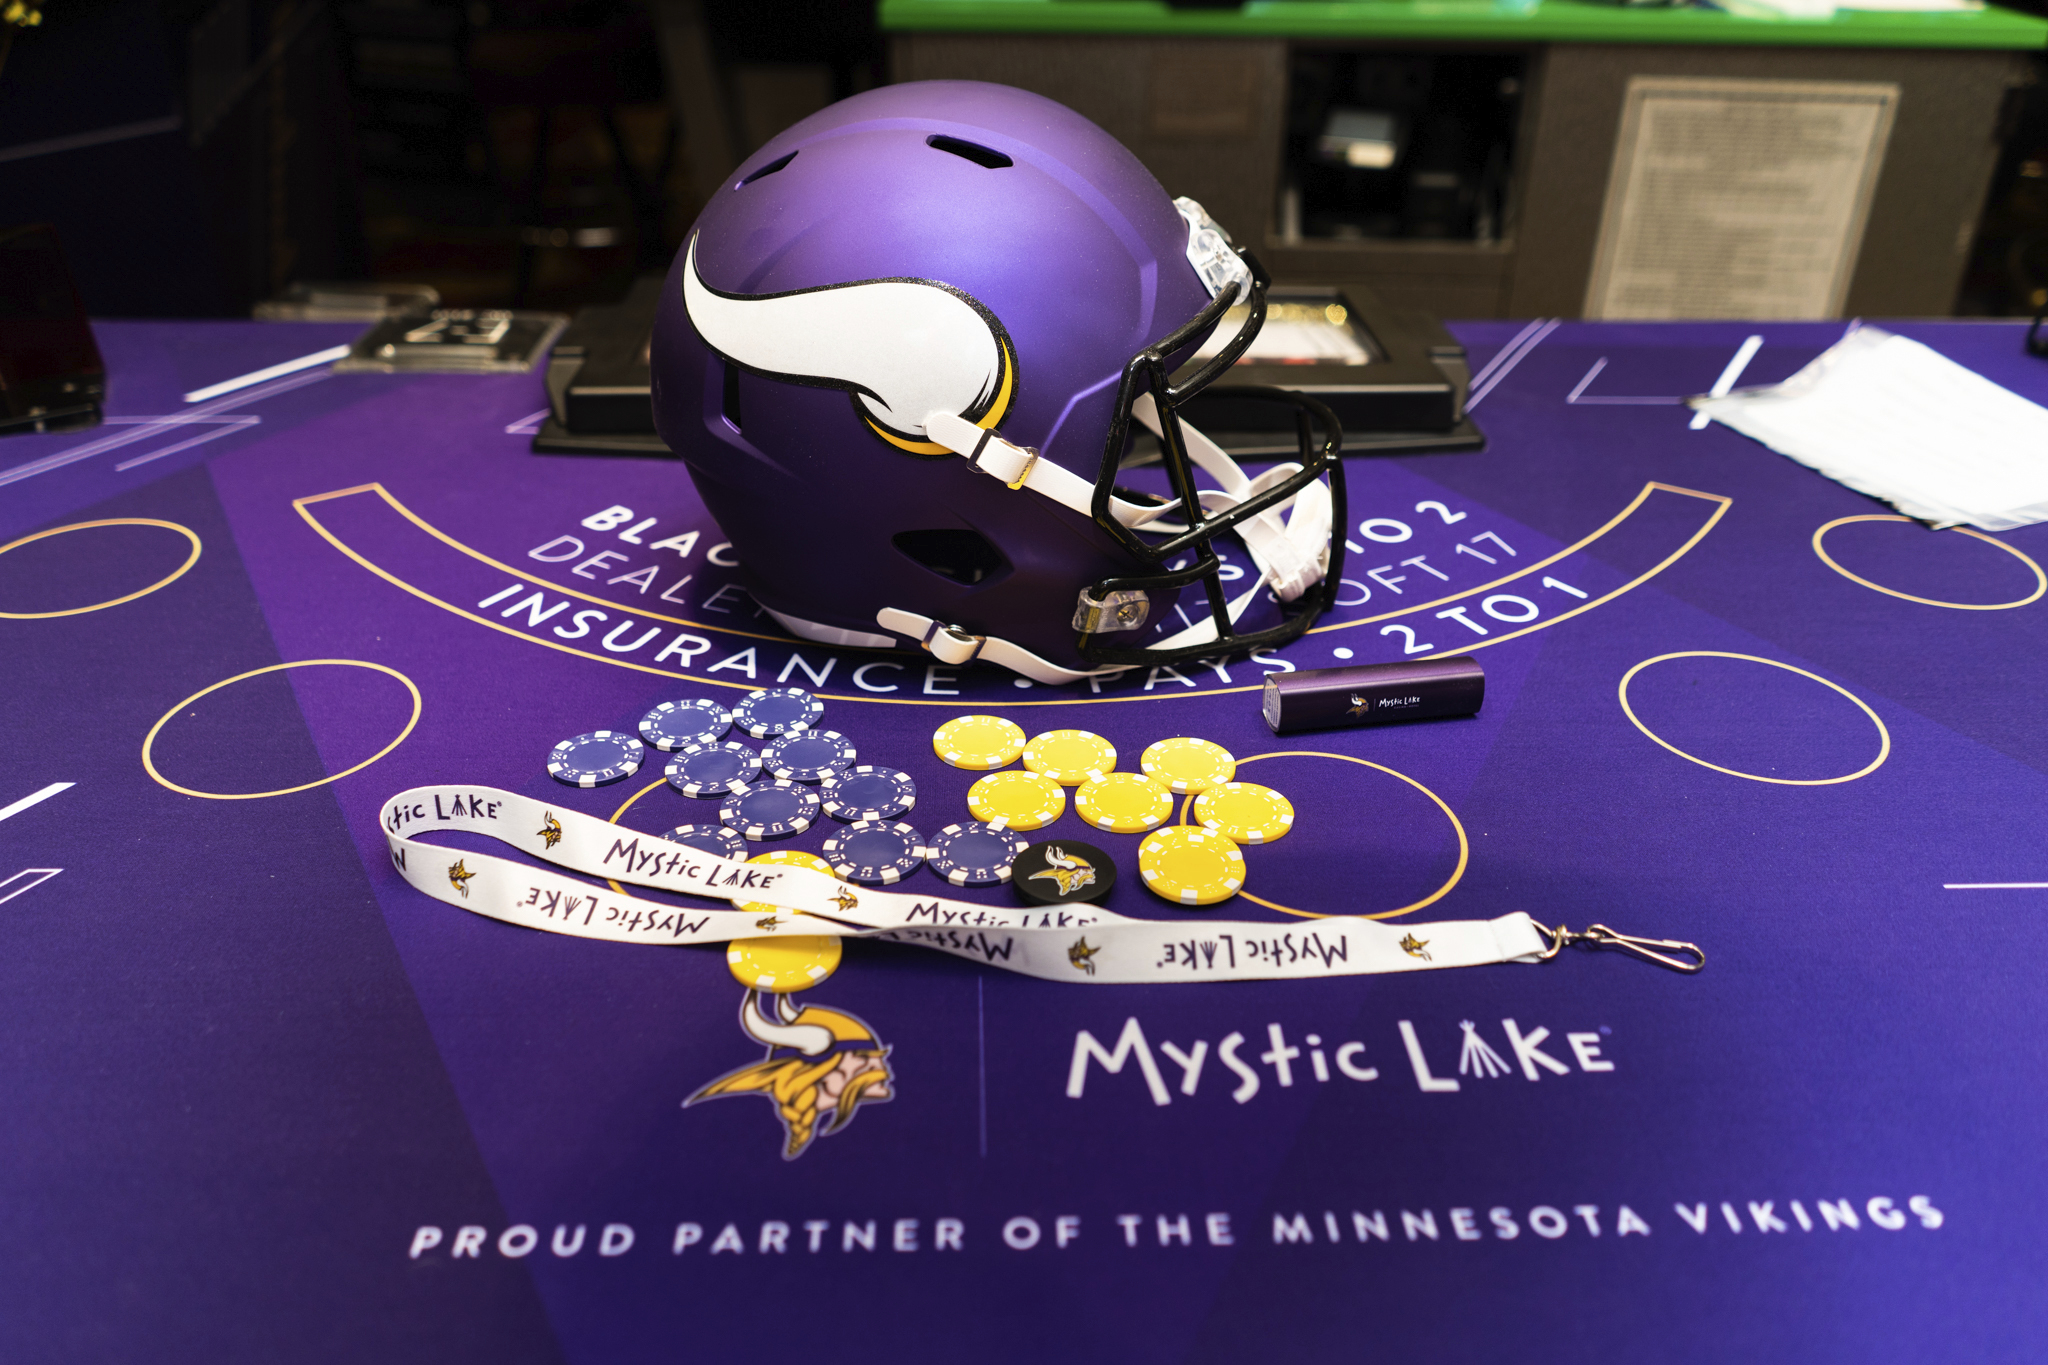 Mystic Lake Unveils New Minnesota Vikings-Themed Gaming Area